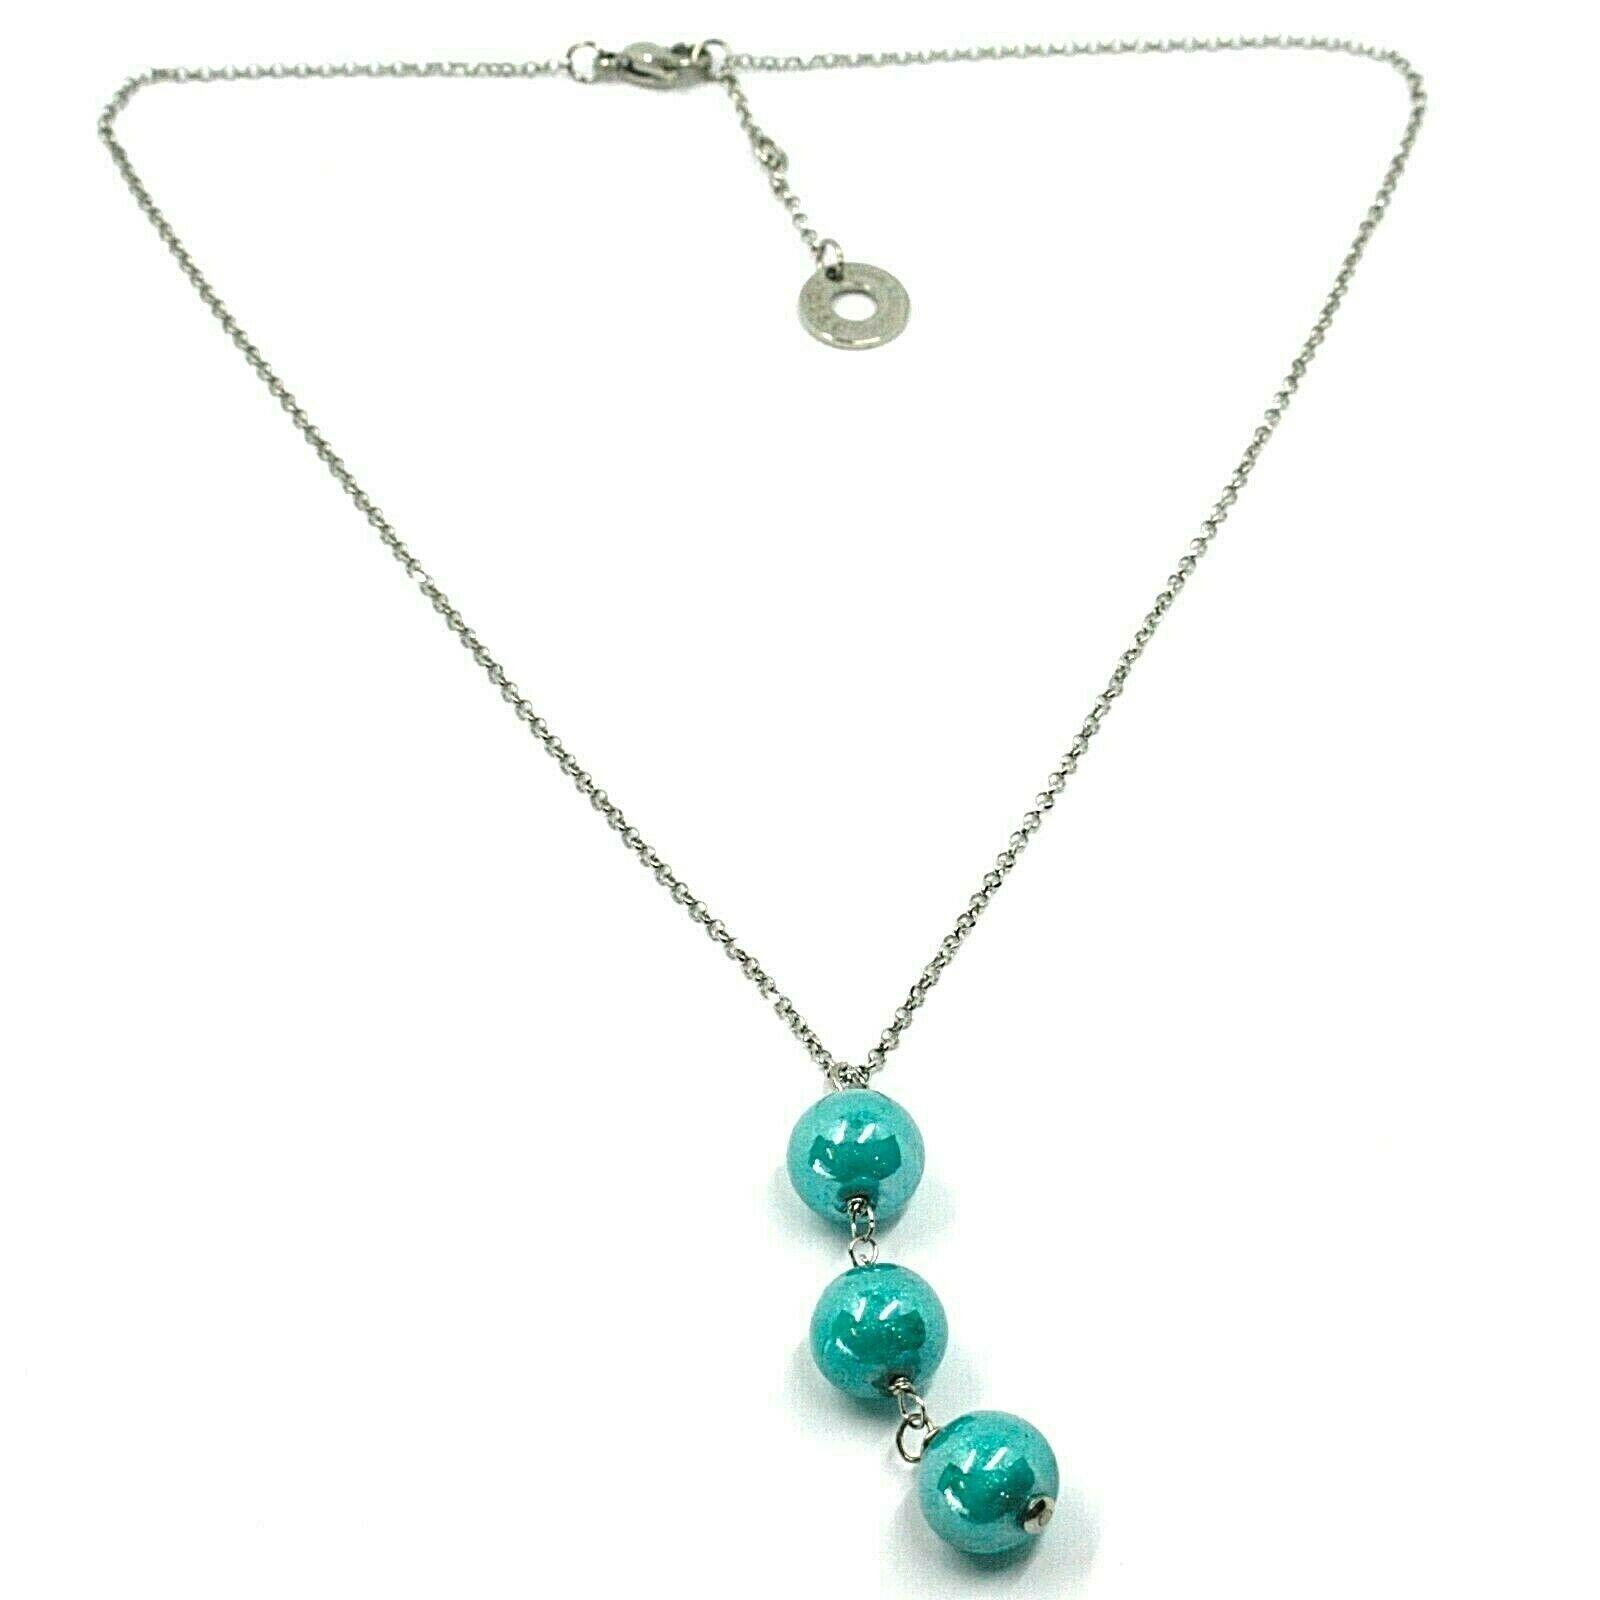 Necklace Antica Murrina Venezia, COA02A06, Spheres Blue Hanging, Chain Rolo '